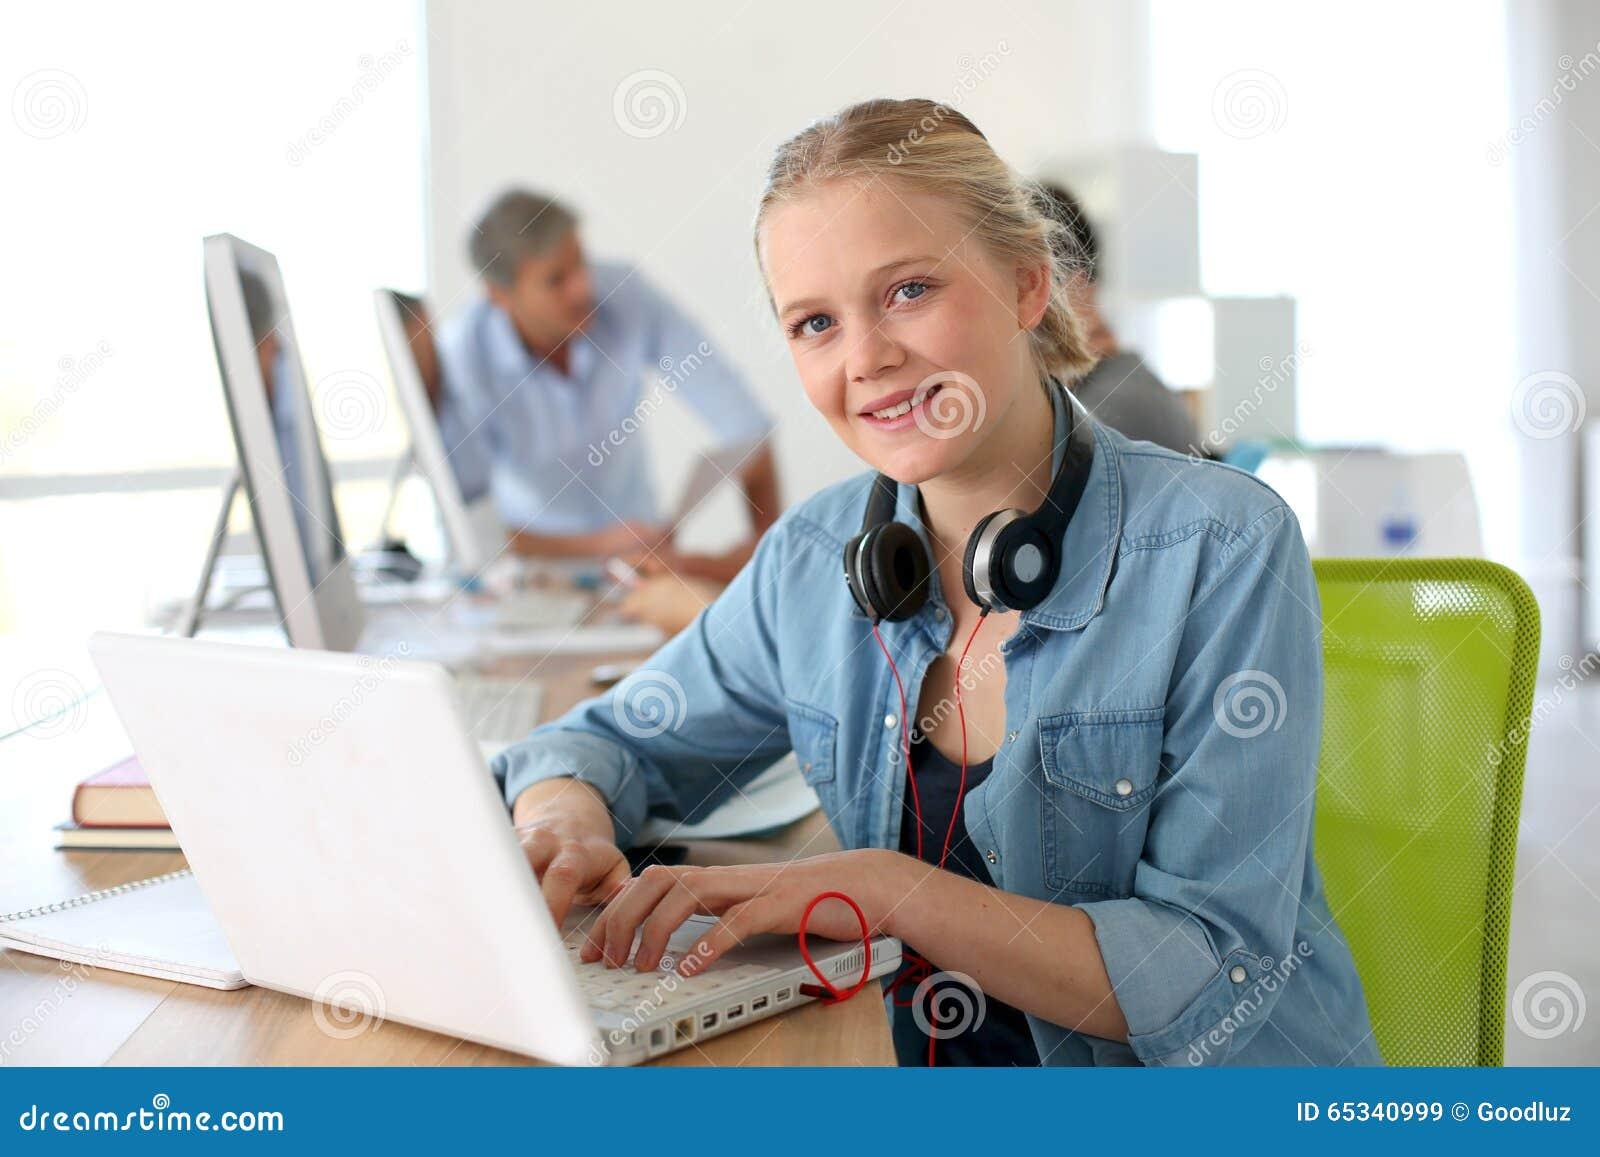 Vrolijk meisje in de gegevensverwerking van klasse die laptop met behulp van